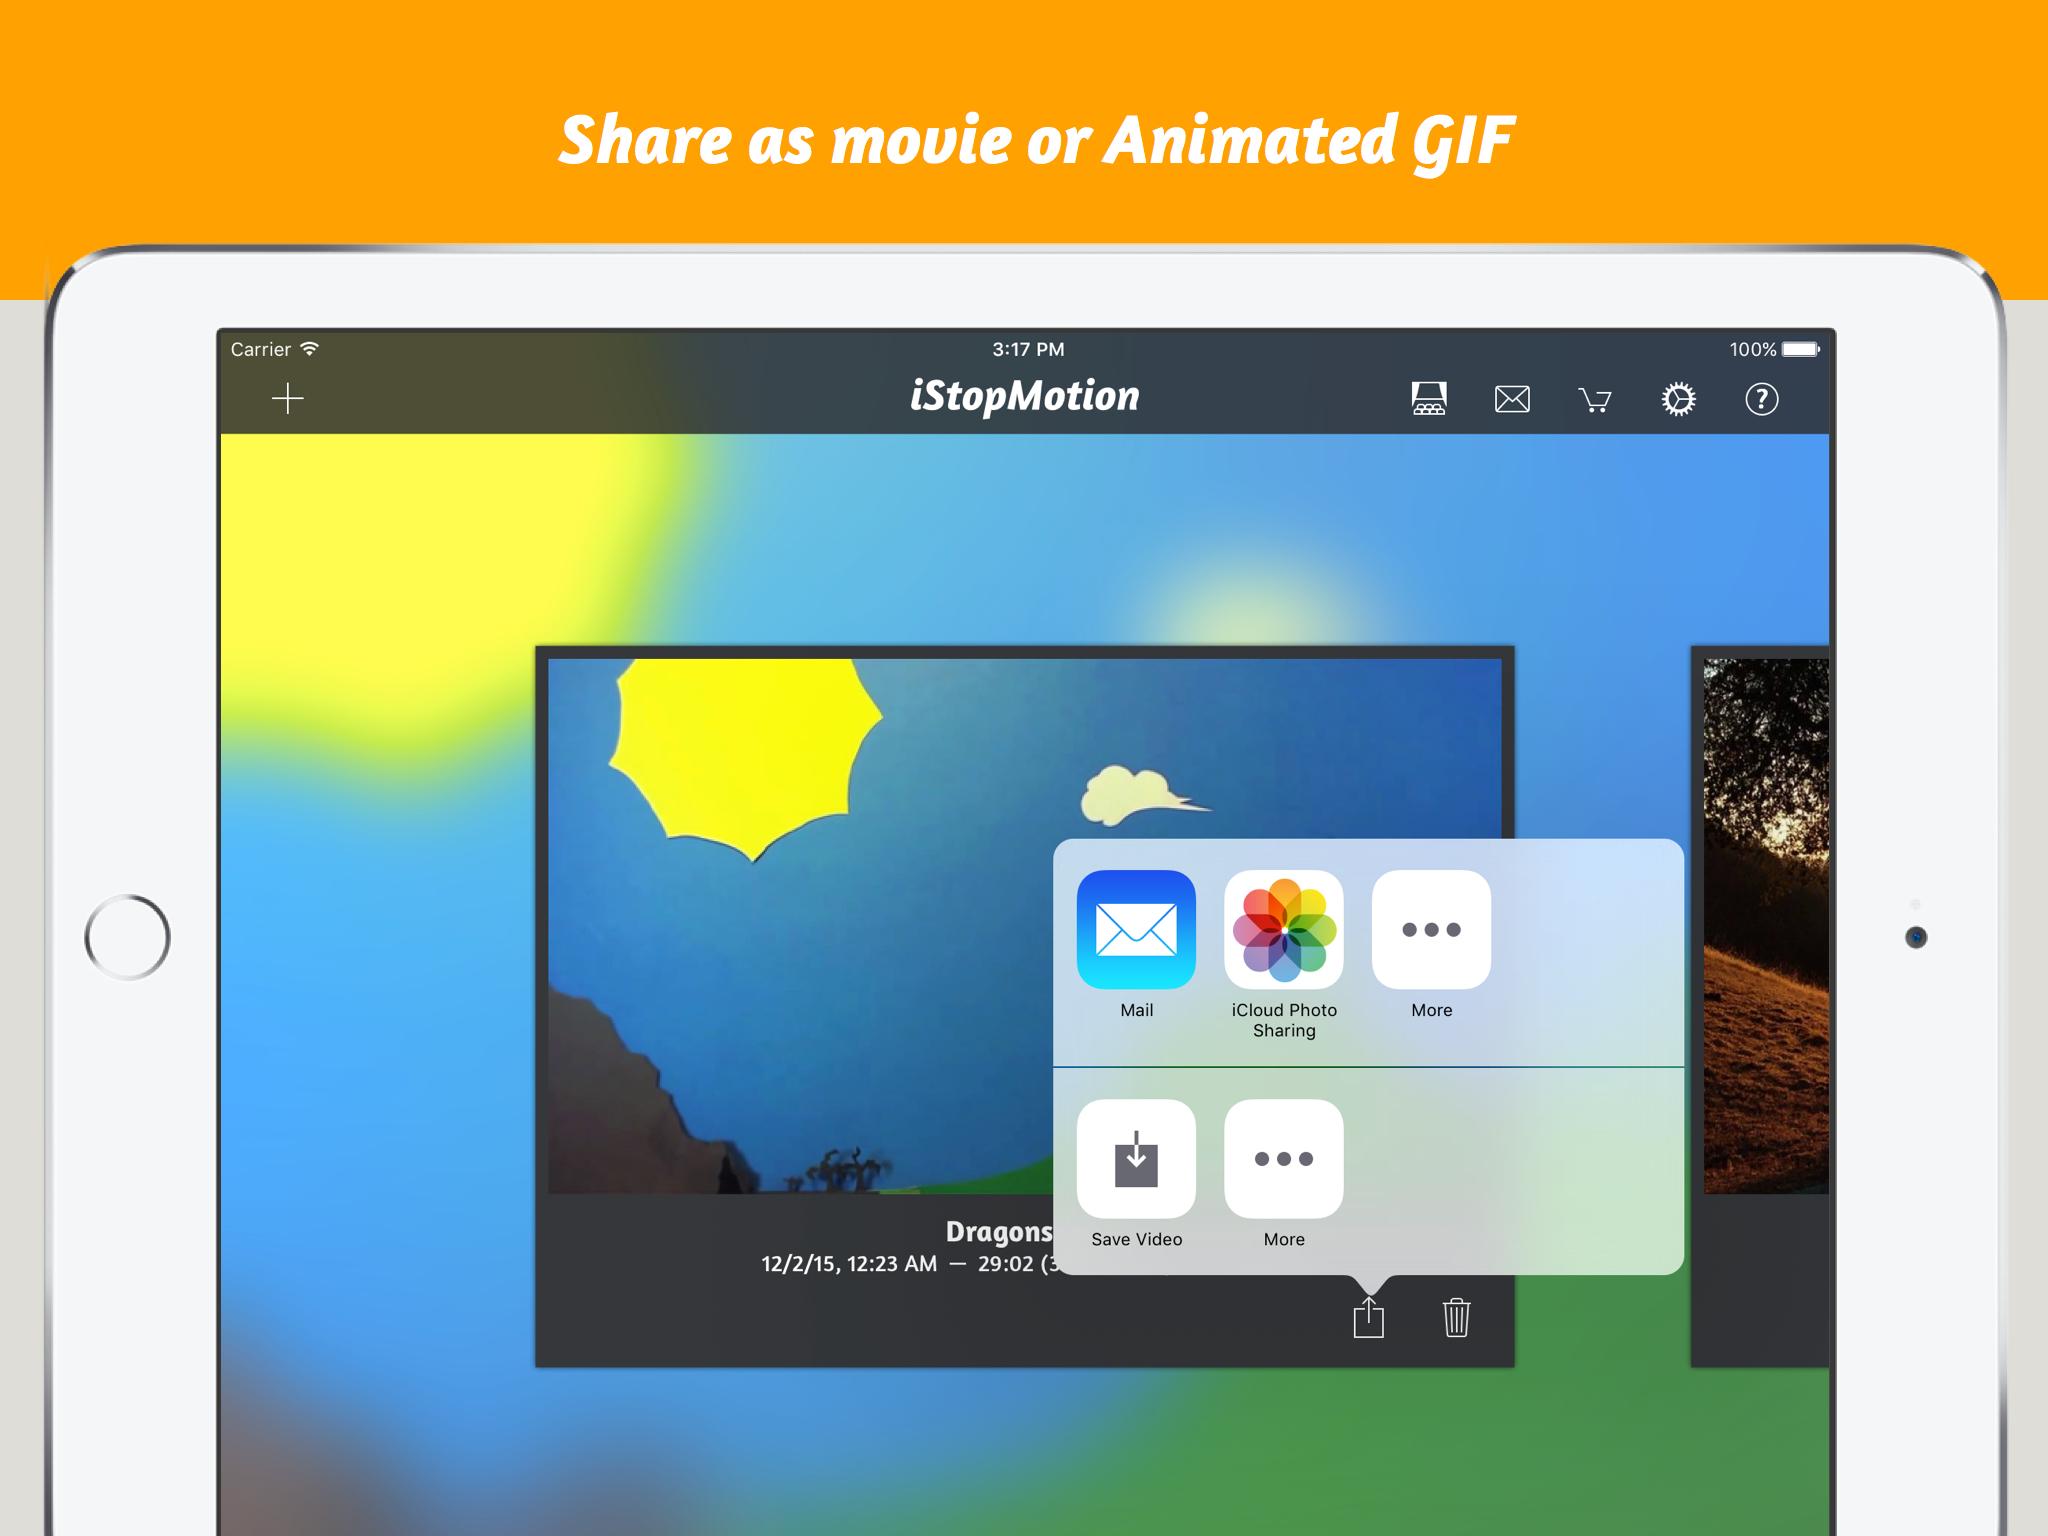 iStopMotioniPad Share